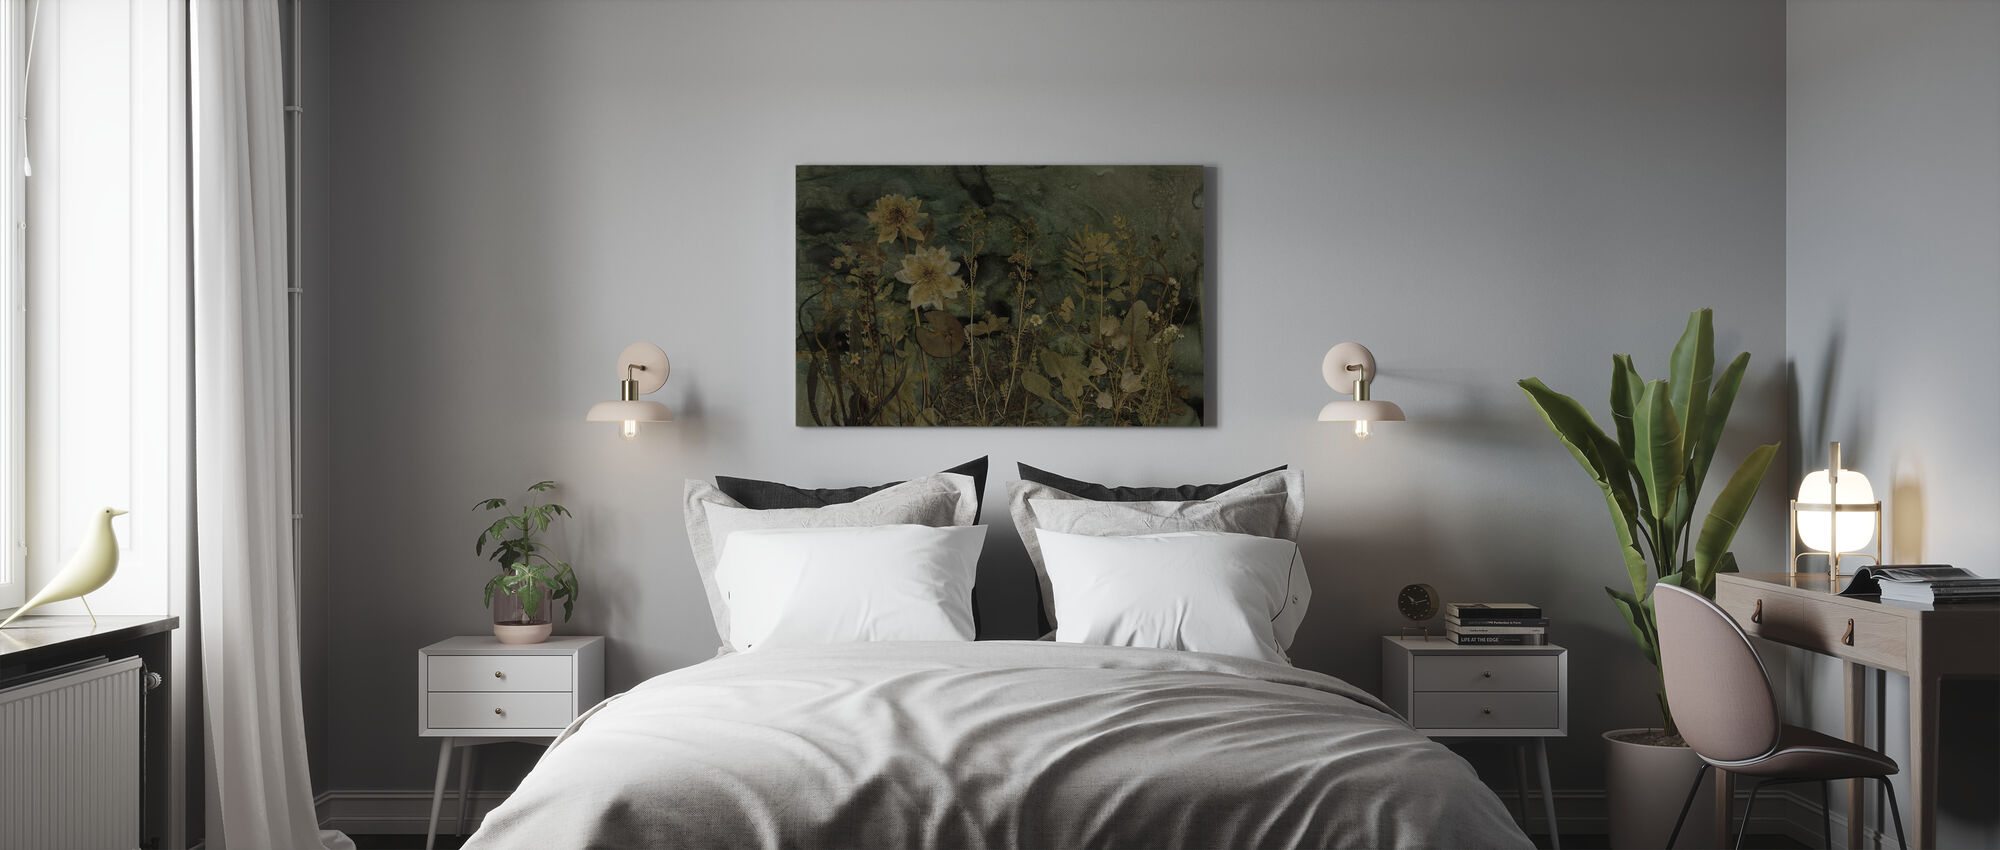 Teddy - Canvas print - Bedroom